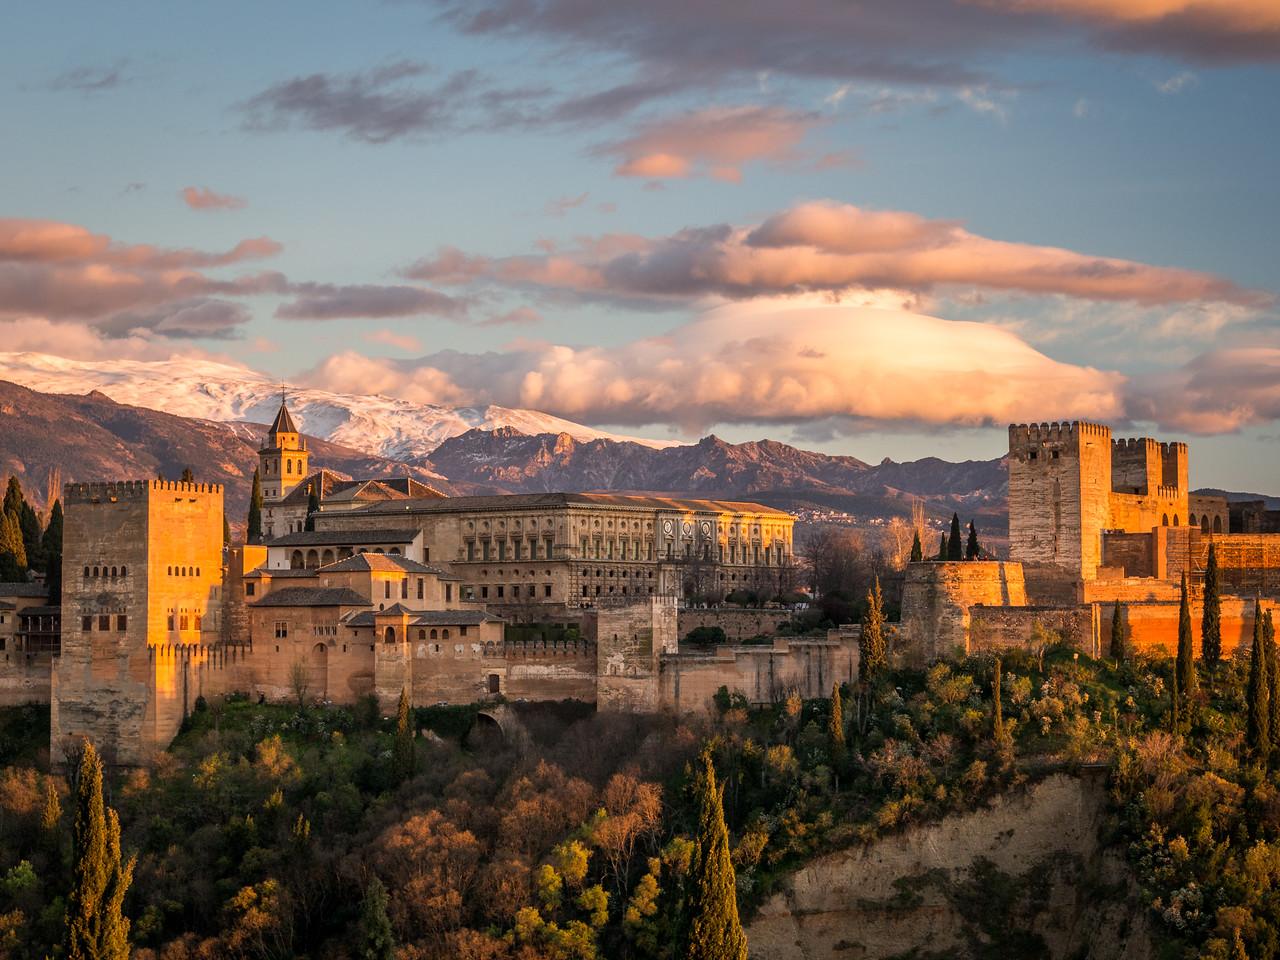 The Alhambra at Sunset, Granada, Spain